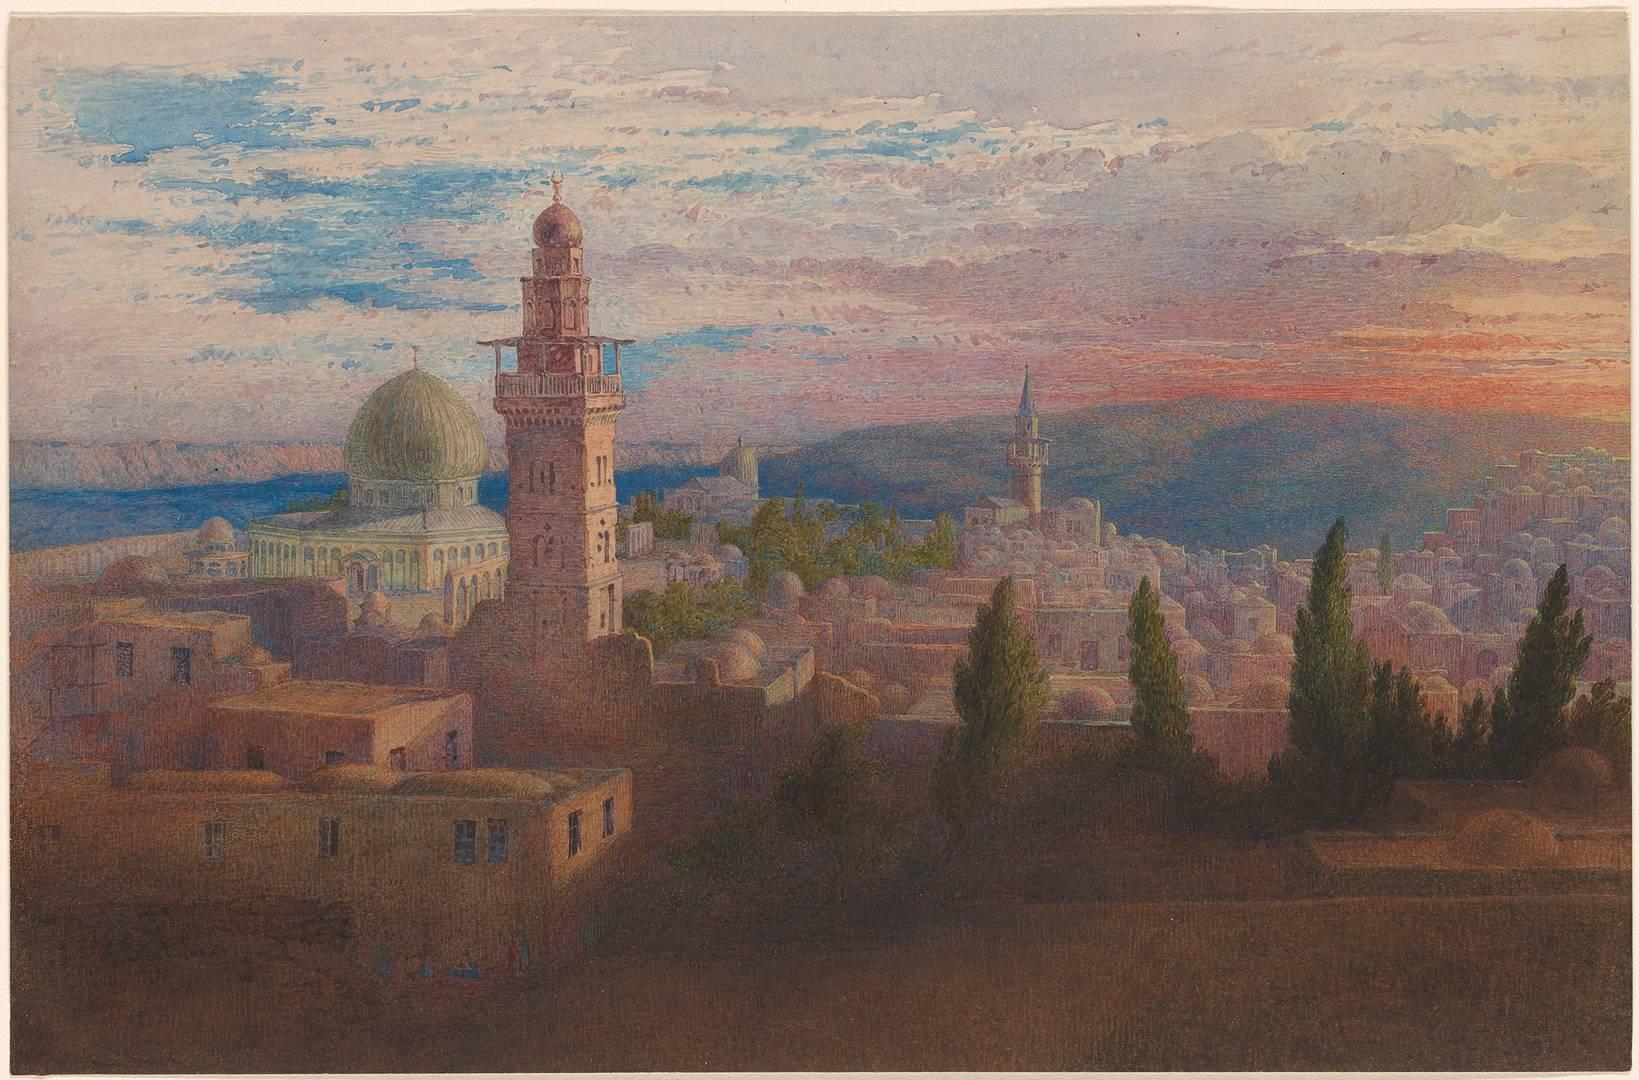 Ричард Дадд. Вид на Иерусалим. 1842–1843